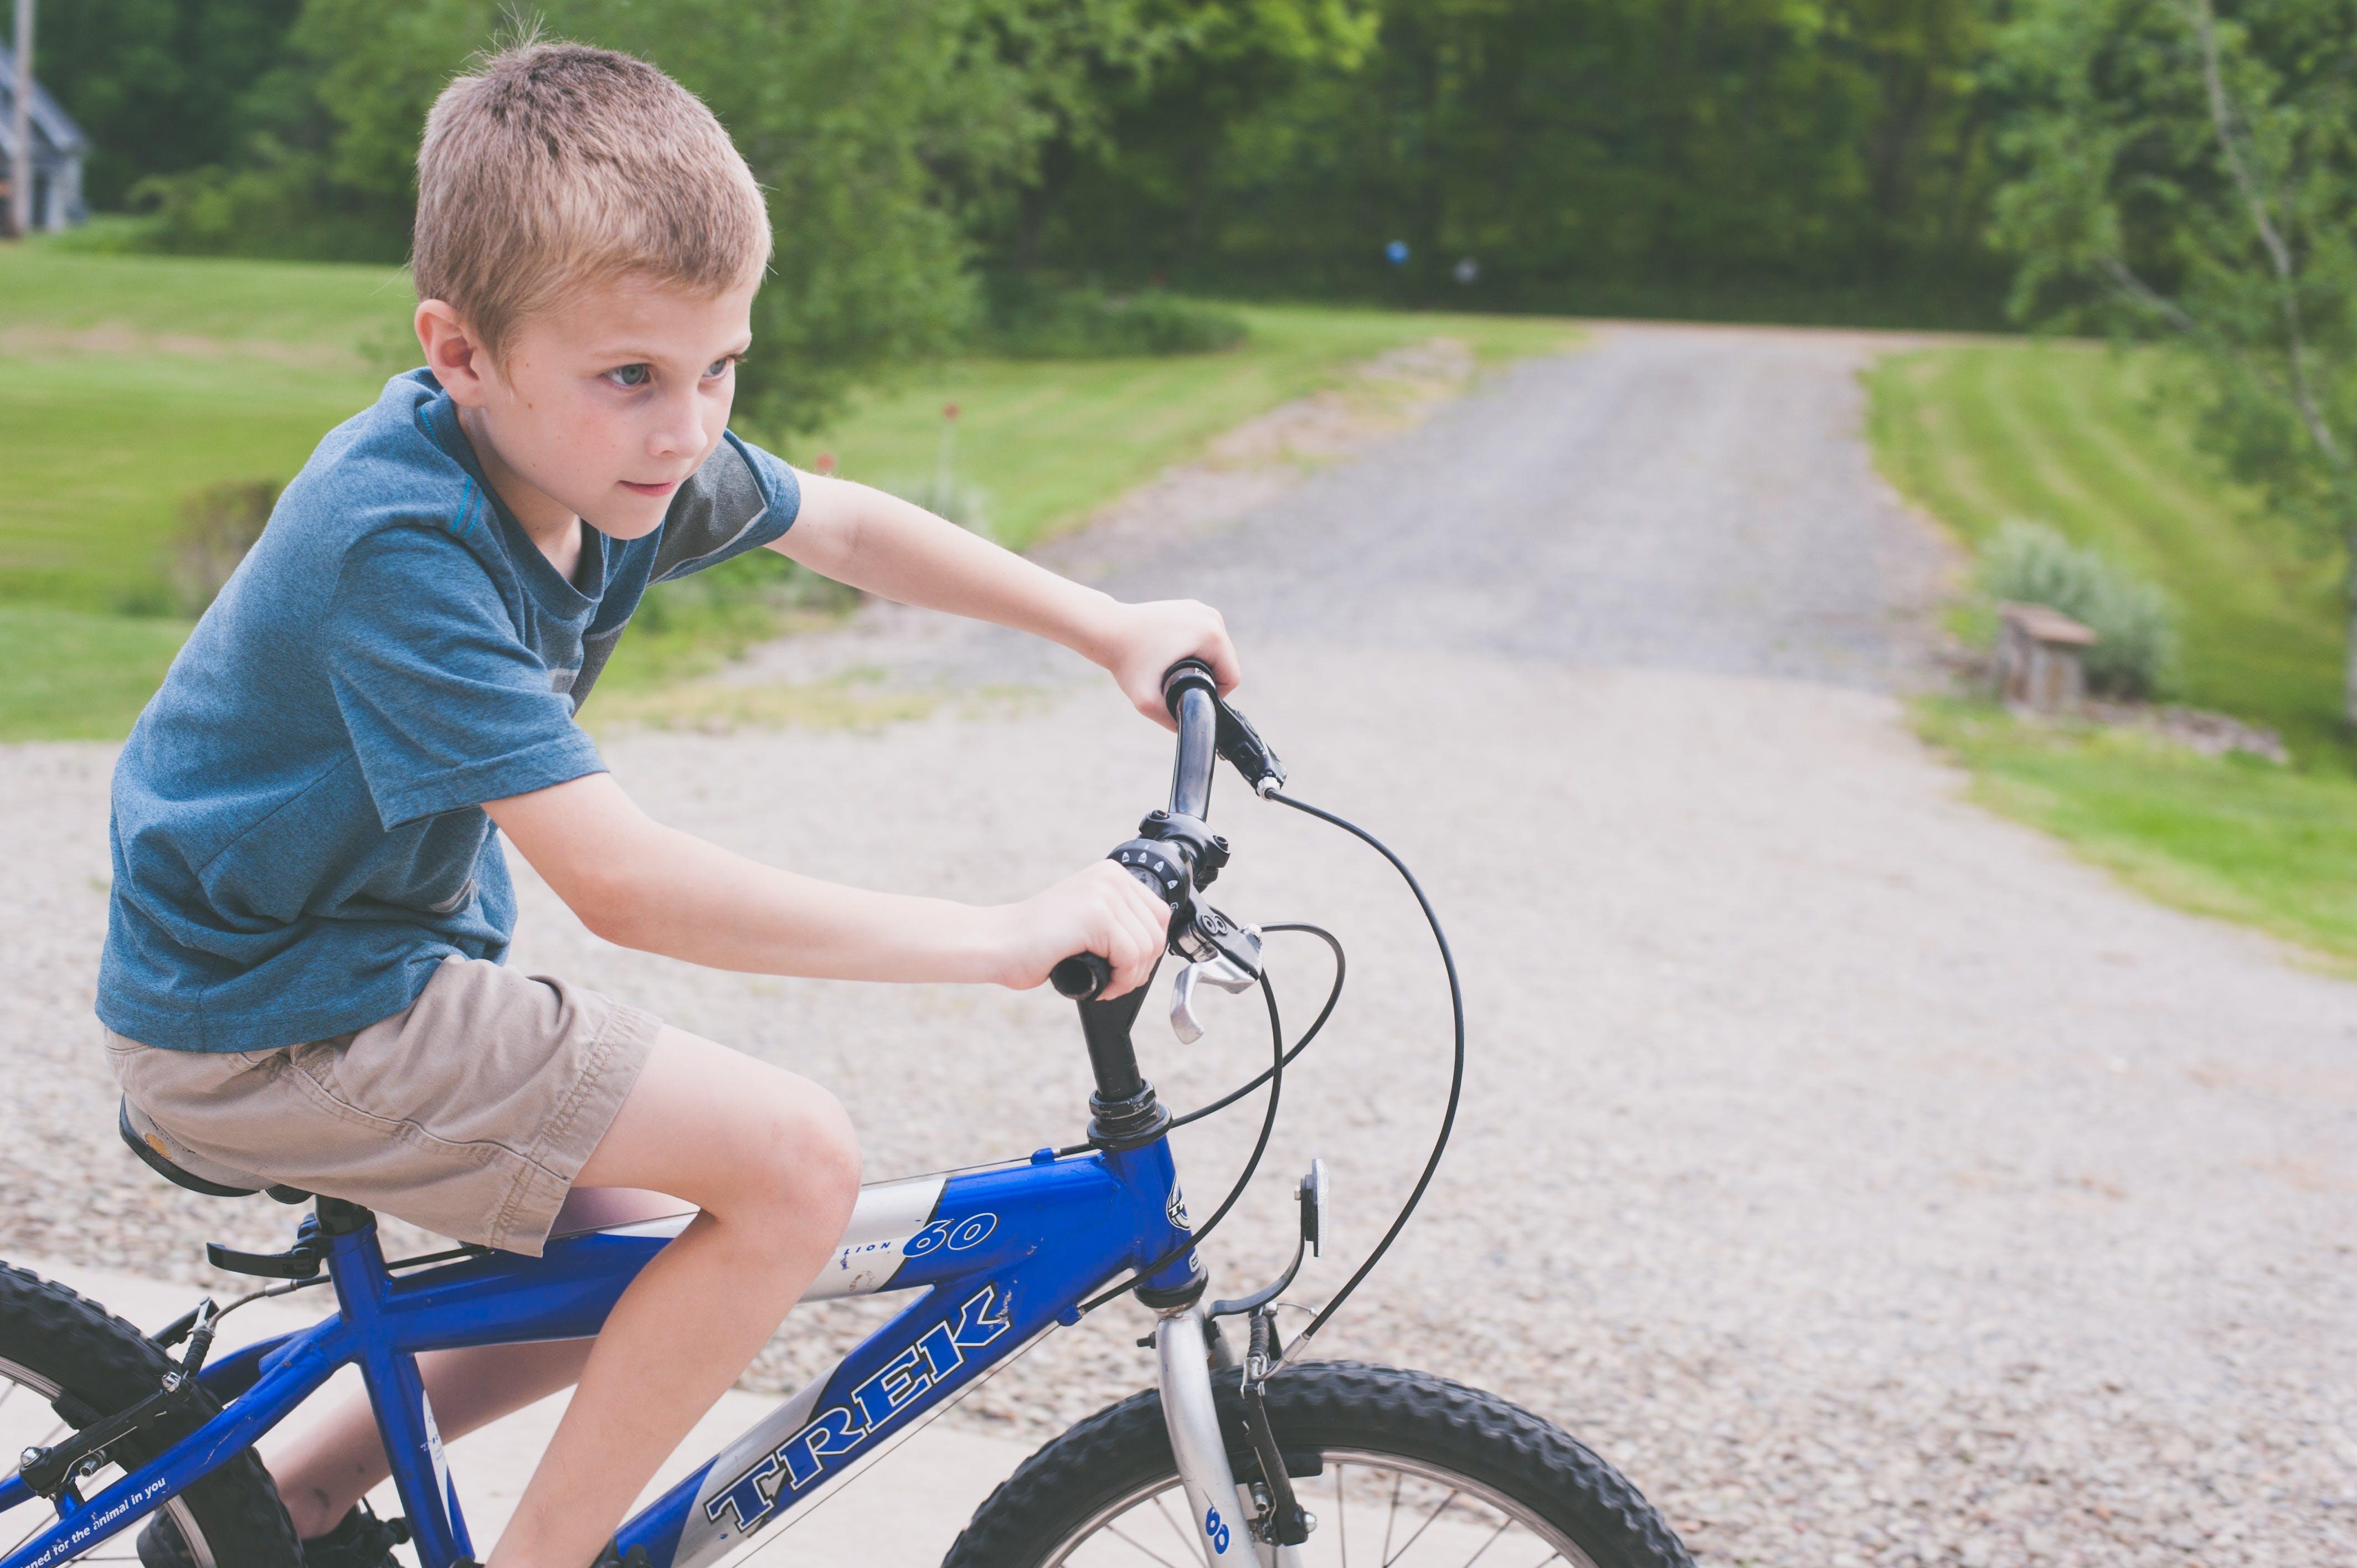 Boy Rides Blue Trek Bike at Daytime